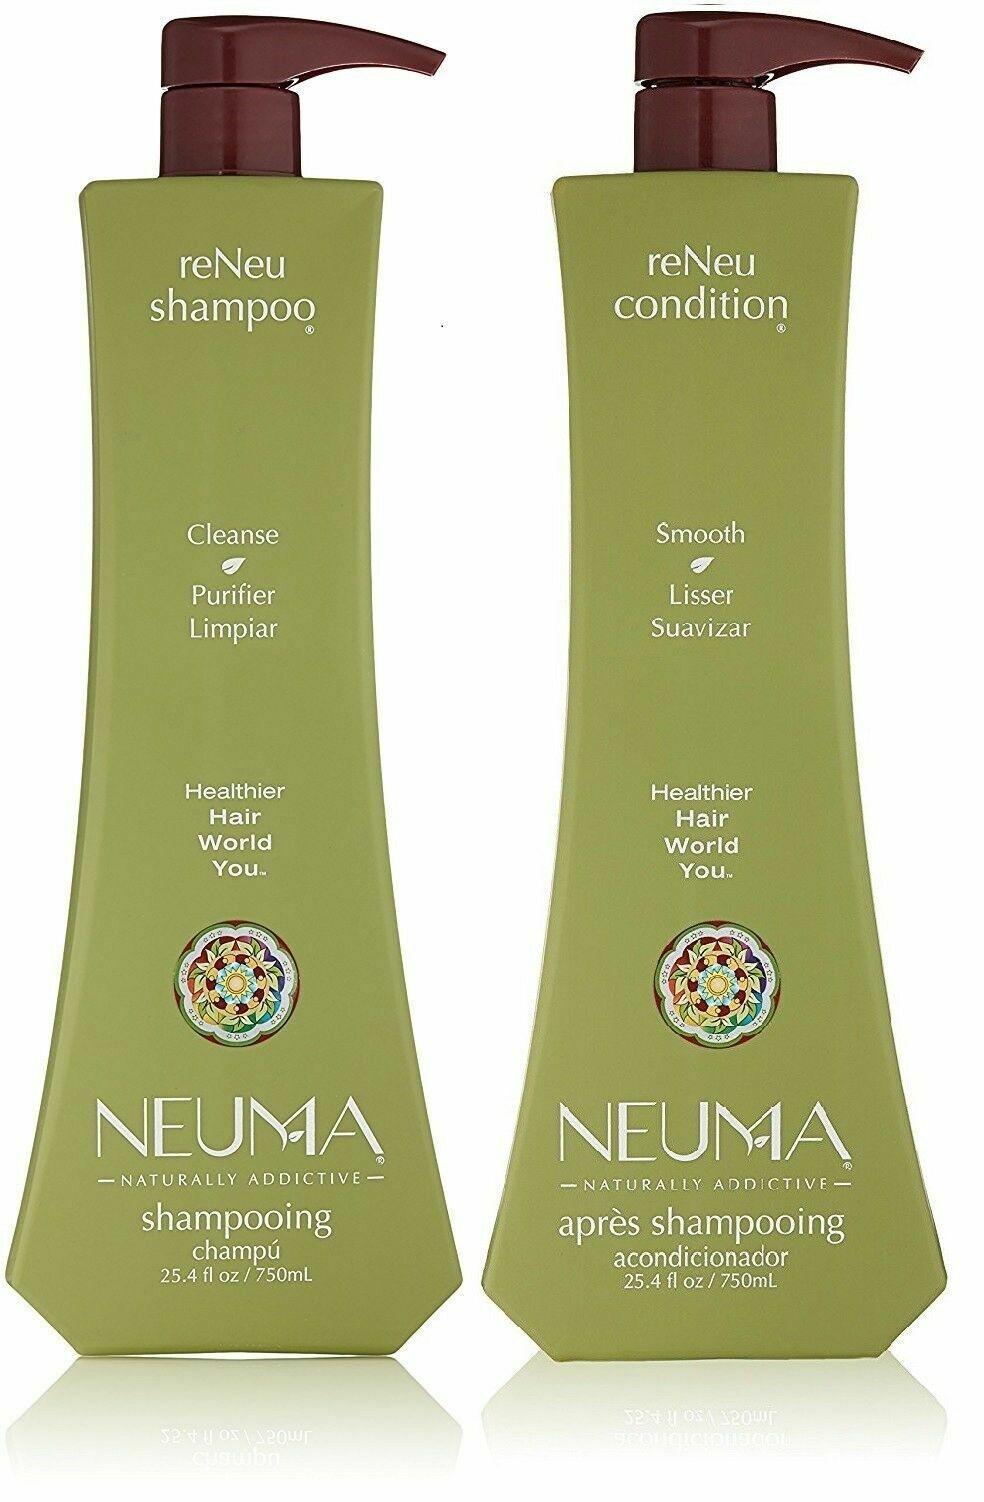 sulfate free reneu shampoo 25 4 oz